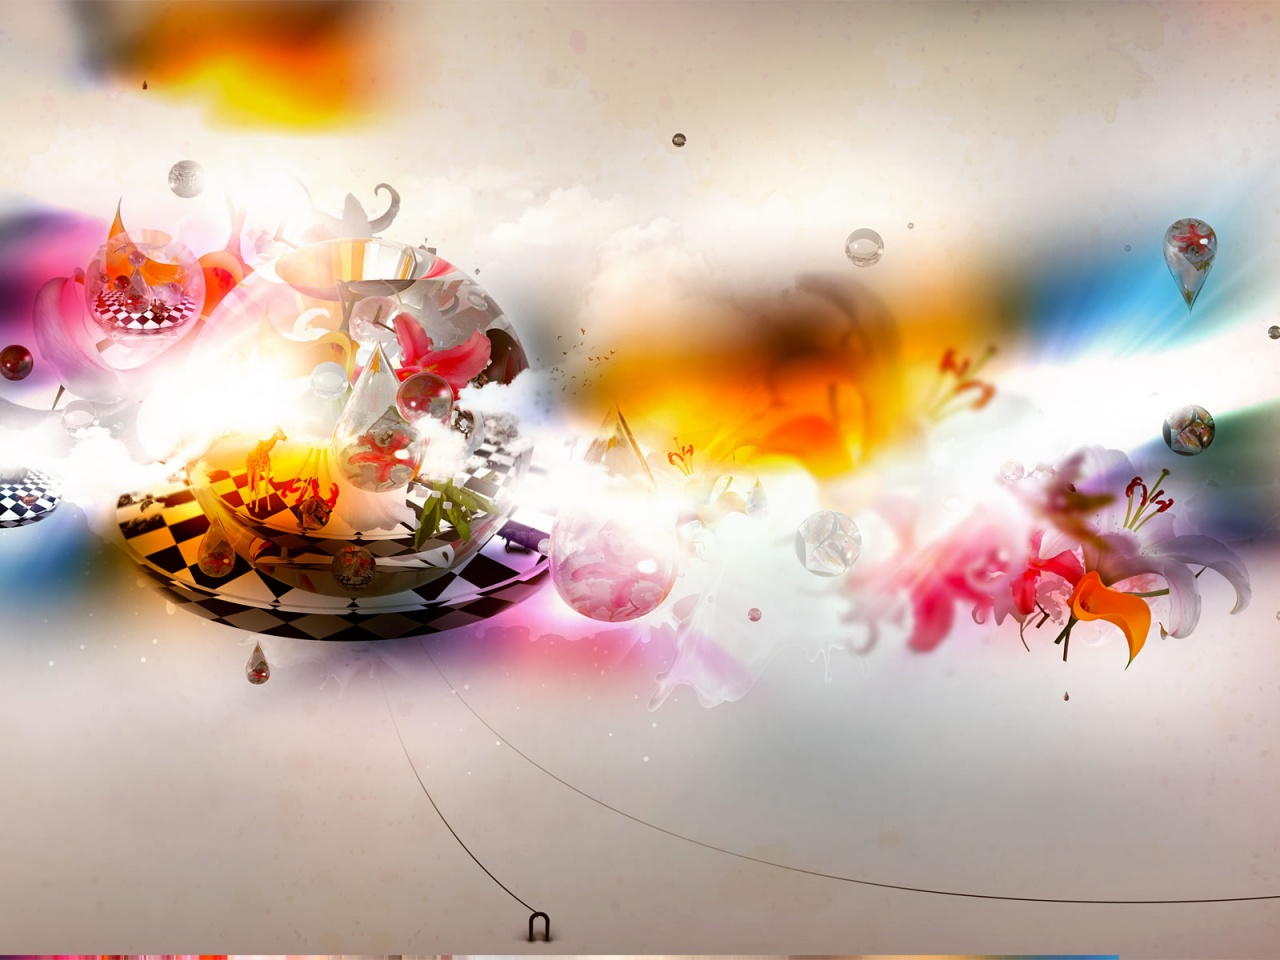 Abstract 246215 Wallpaper wallpaper